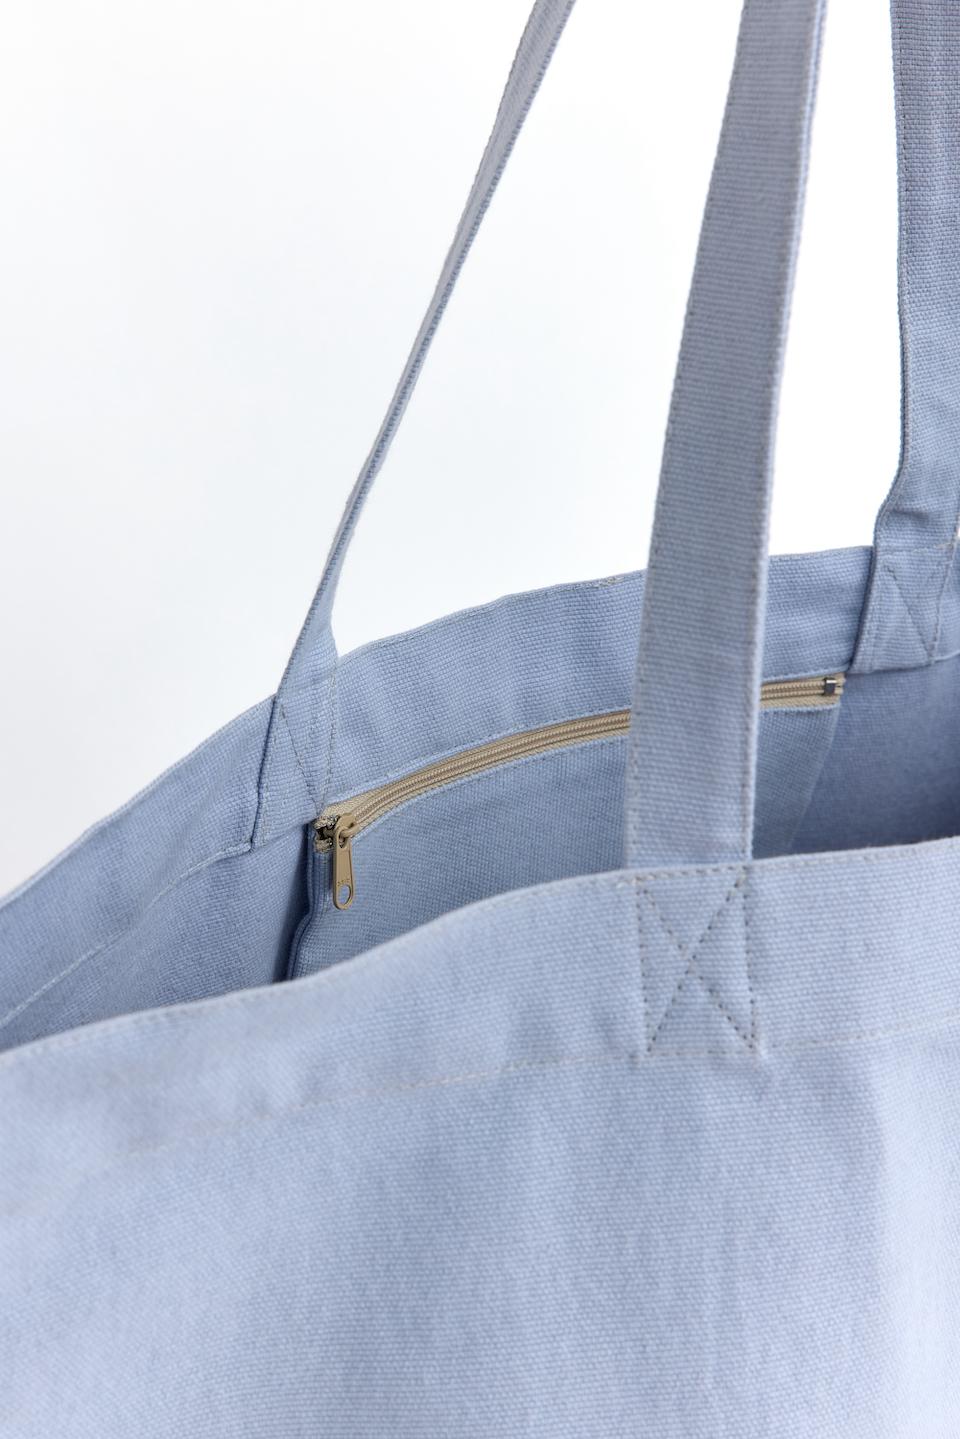 CPH BAG 015 recycle canvas blueberry - alternative 3